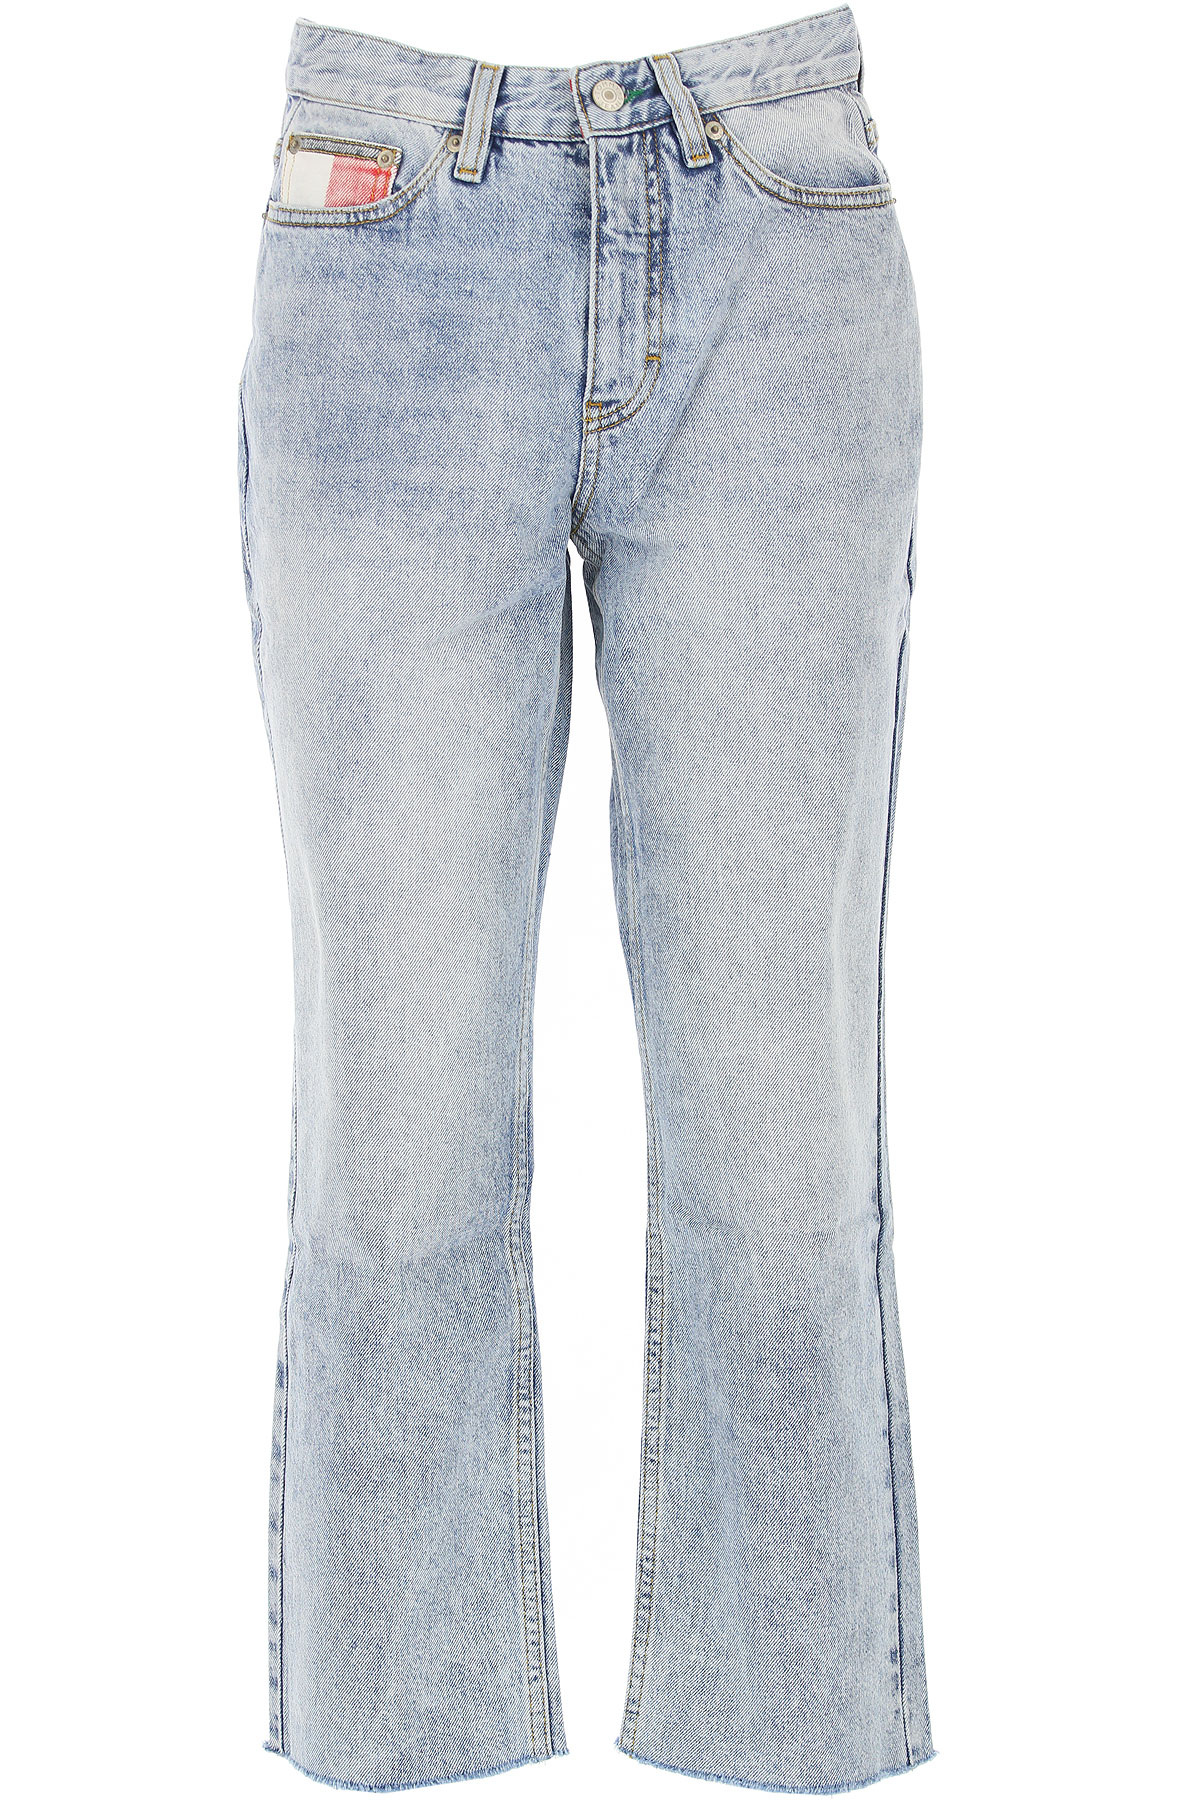 Tommy Hilfiger Jeans On Sale, Denim, Cotton, 2017, 26 27 28 29 30